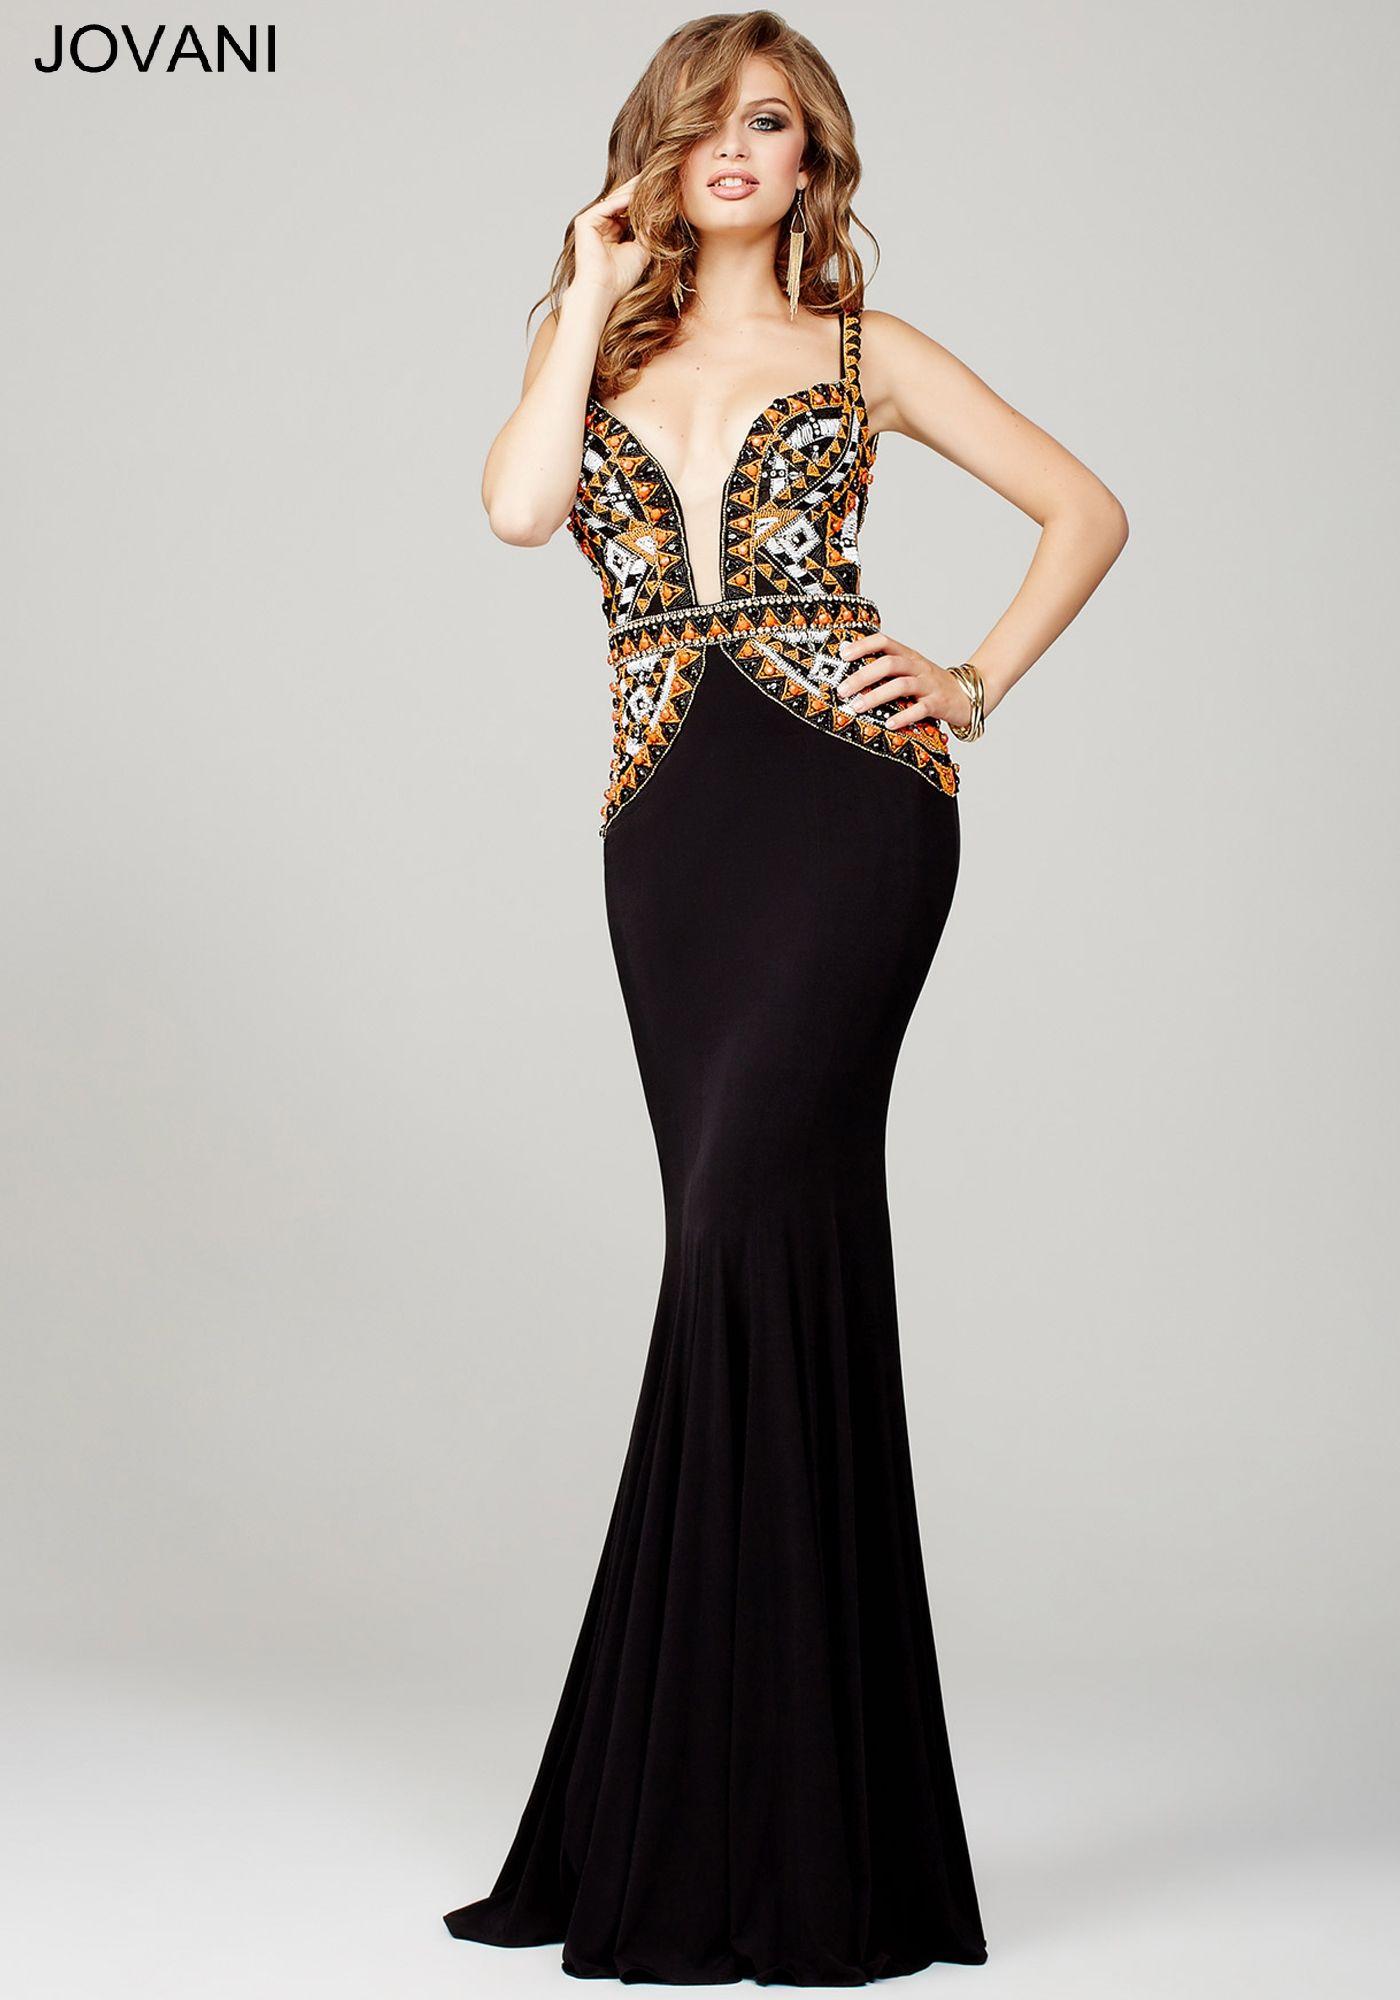 Black/Multi Jersey Prom Dress 35125 | Night Dresses | Pinterest ...